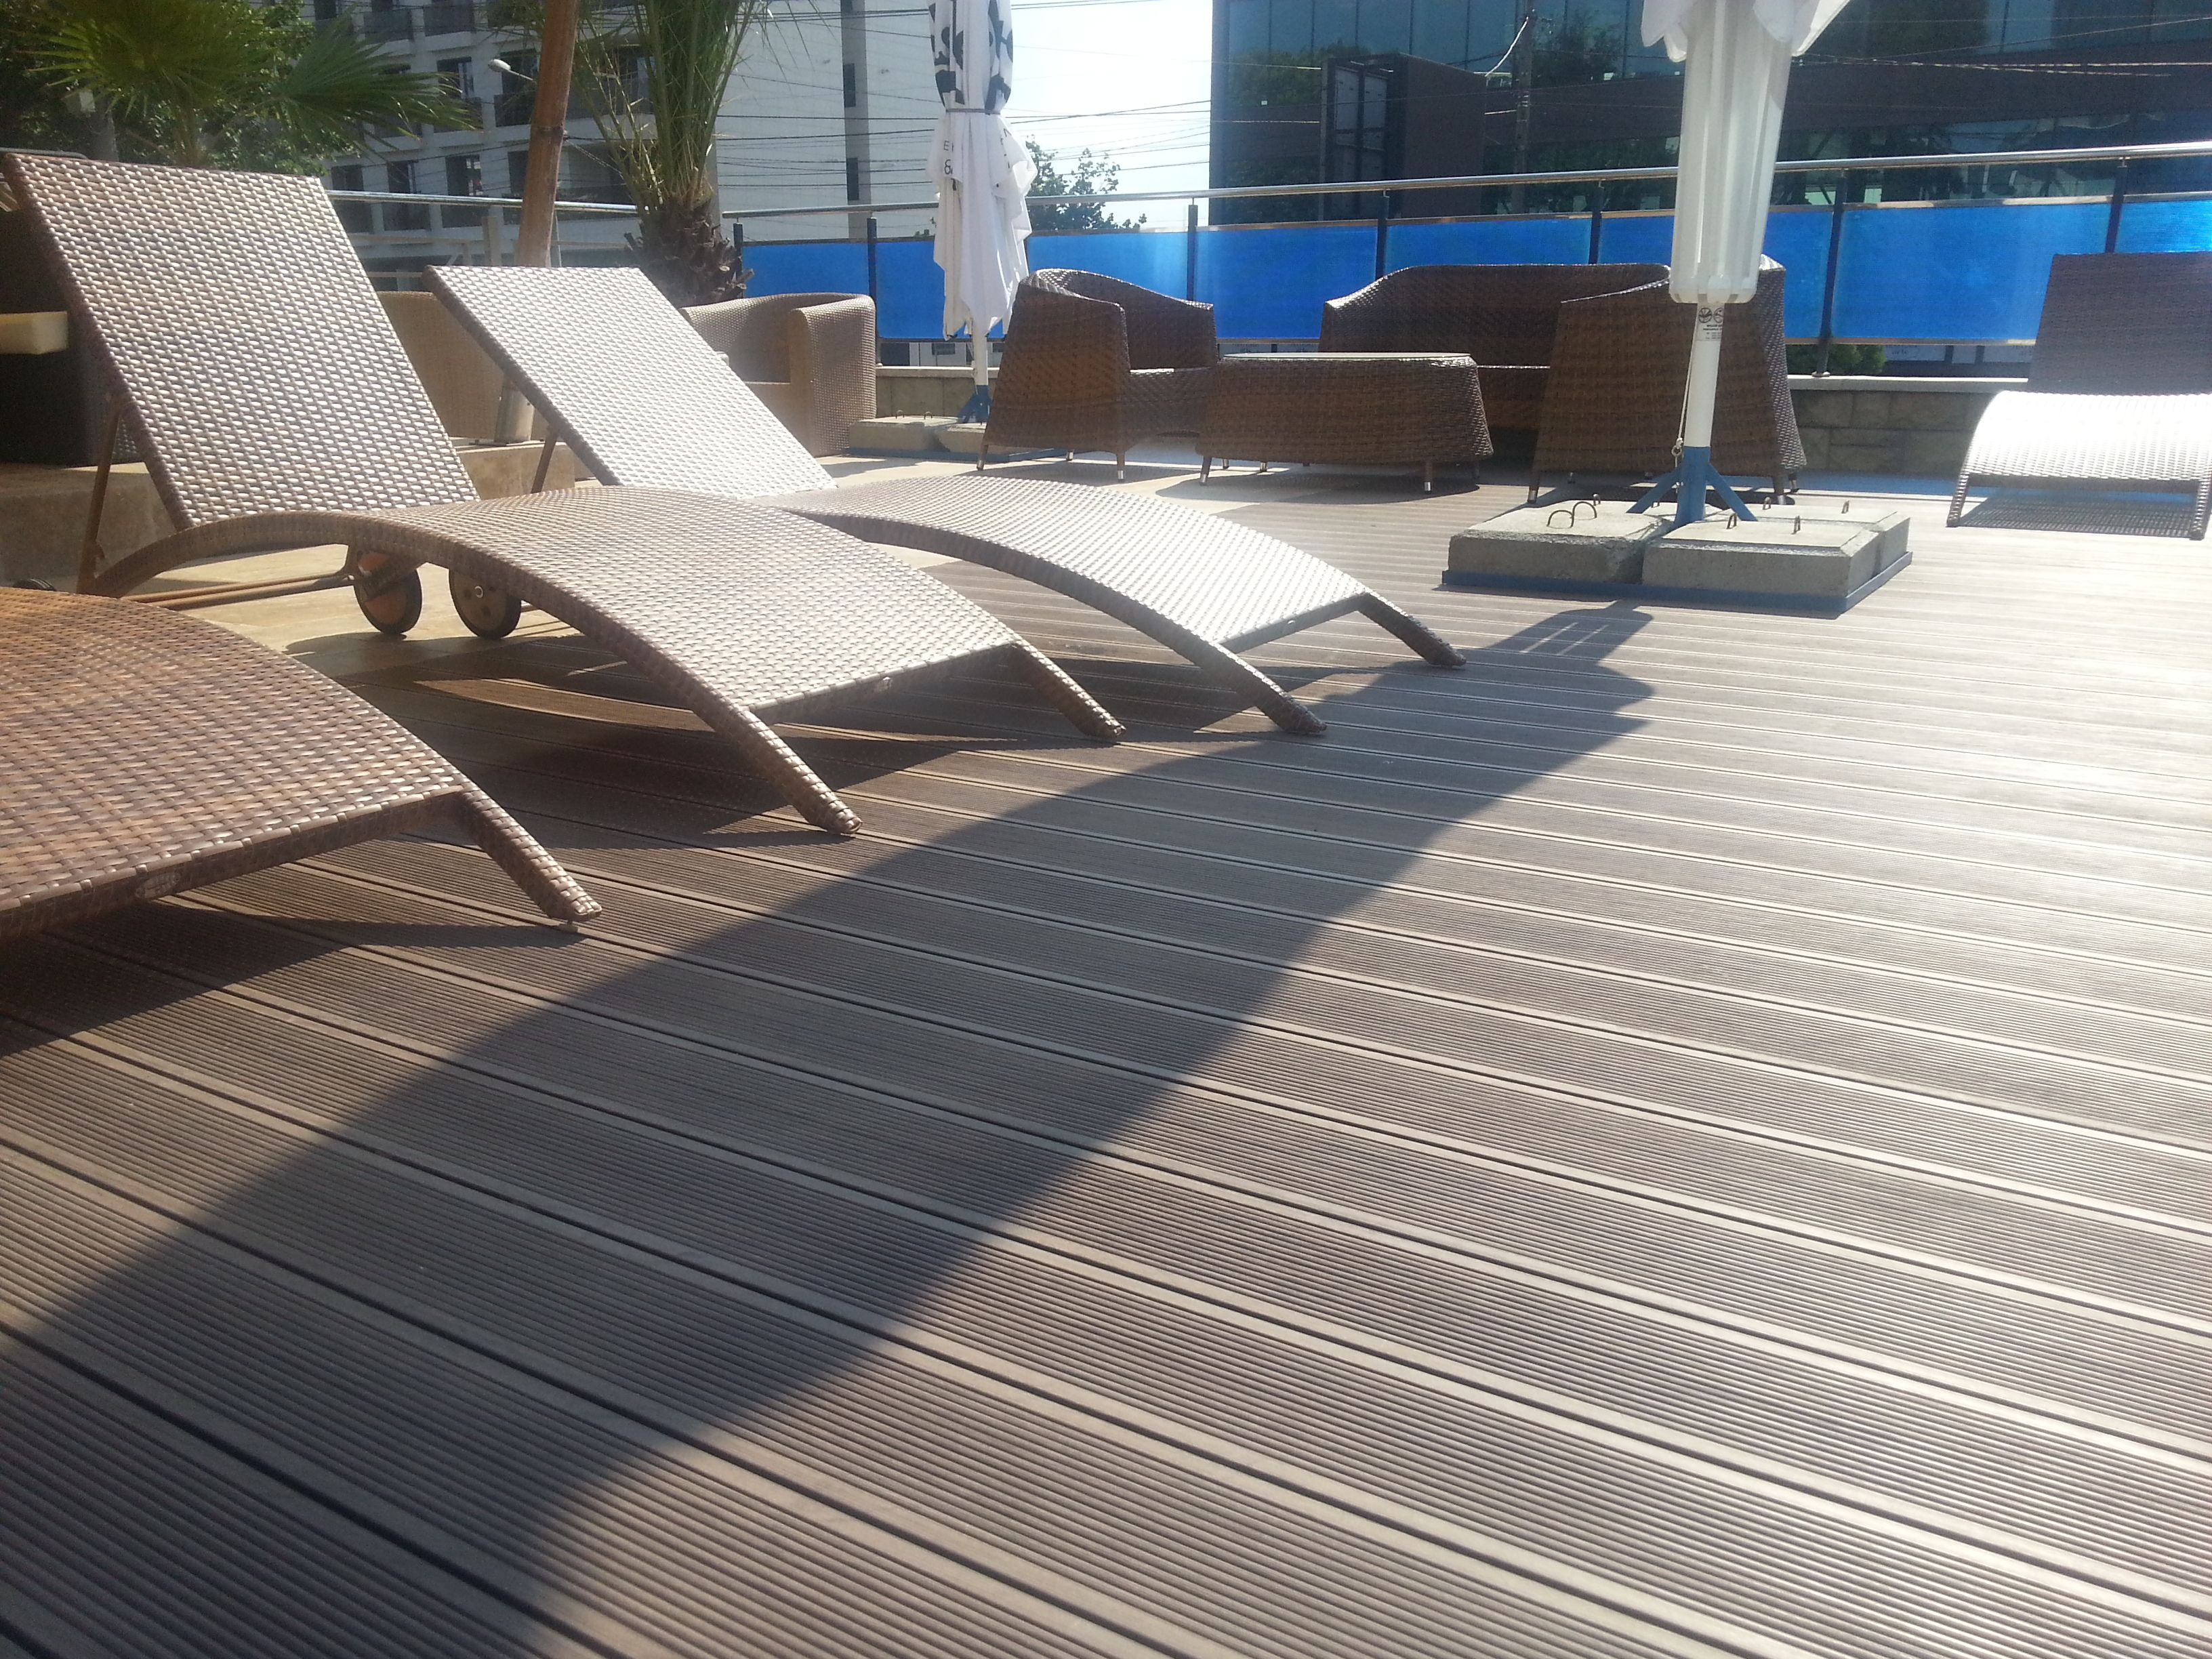 Wpc floor tiles design for terrace wpc decking composite deck wpc floor tiles design for terrace baanklon Images